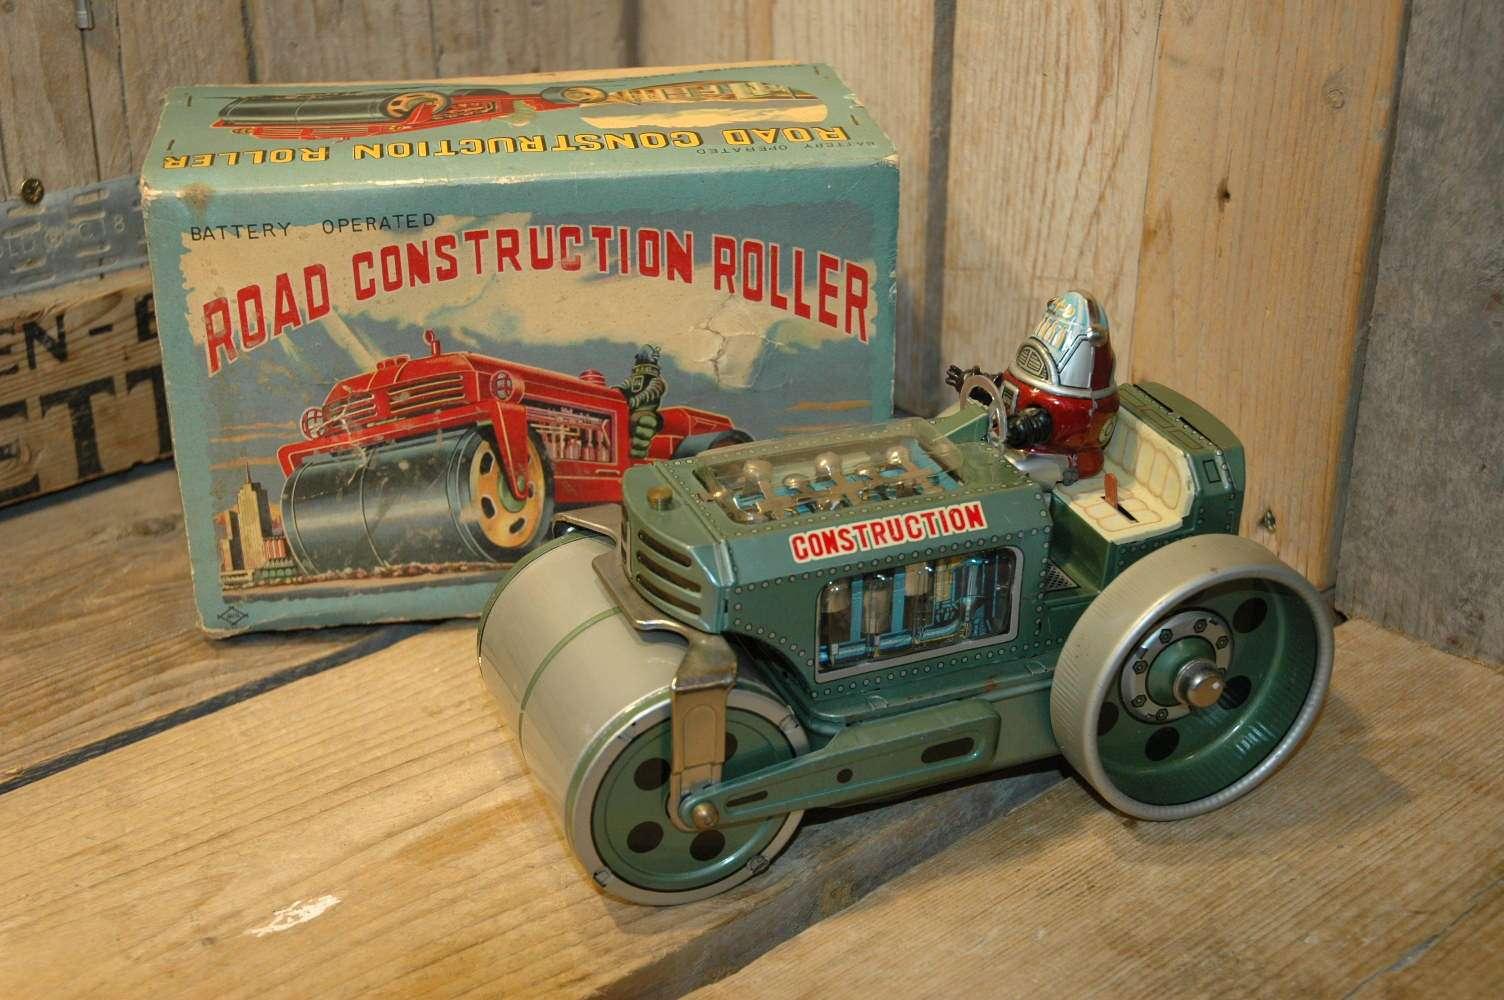 Daiya - Robby Road Construction Roller